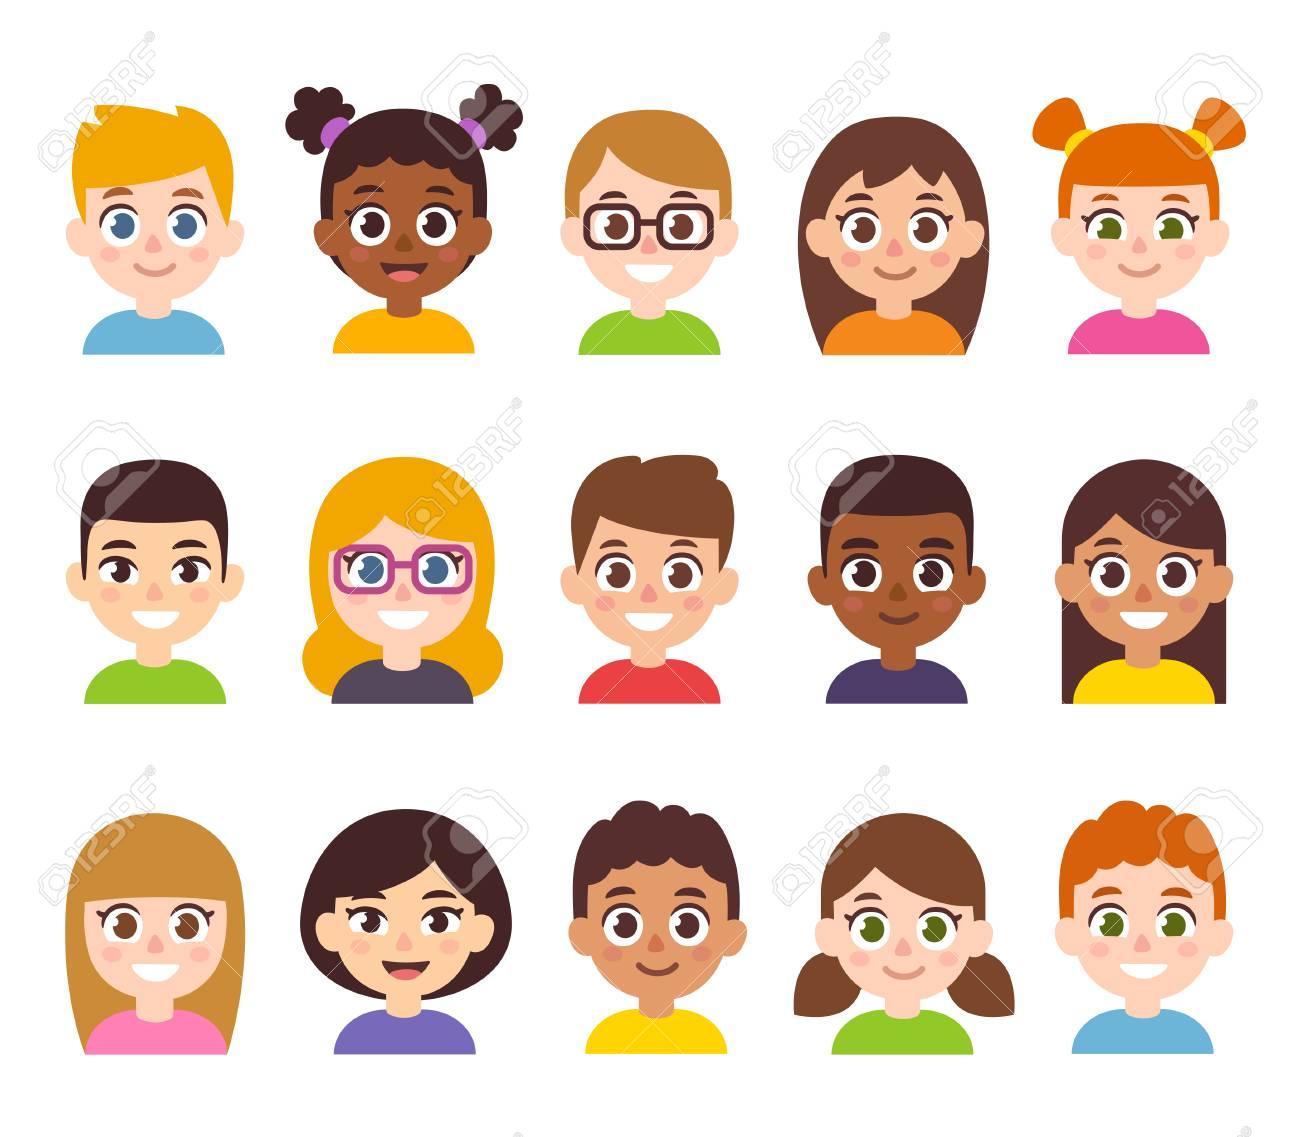 7f2db2349 Cartoon Children Avatar Set. Cute Diverse Kids Faces